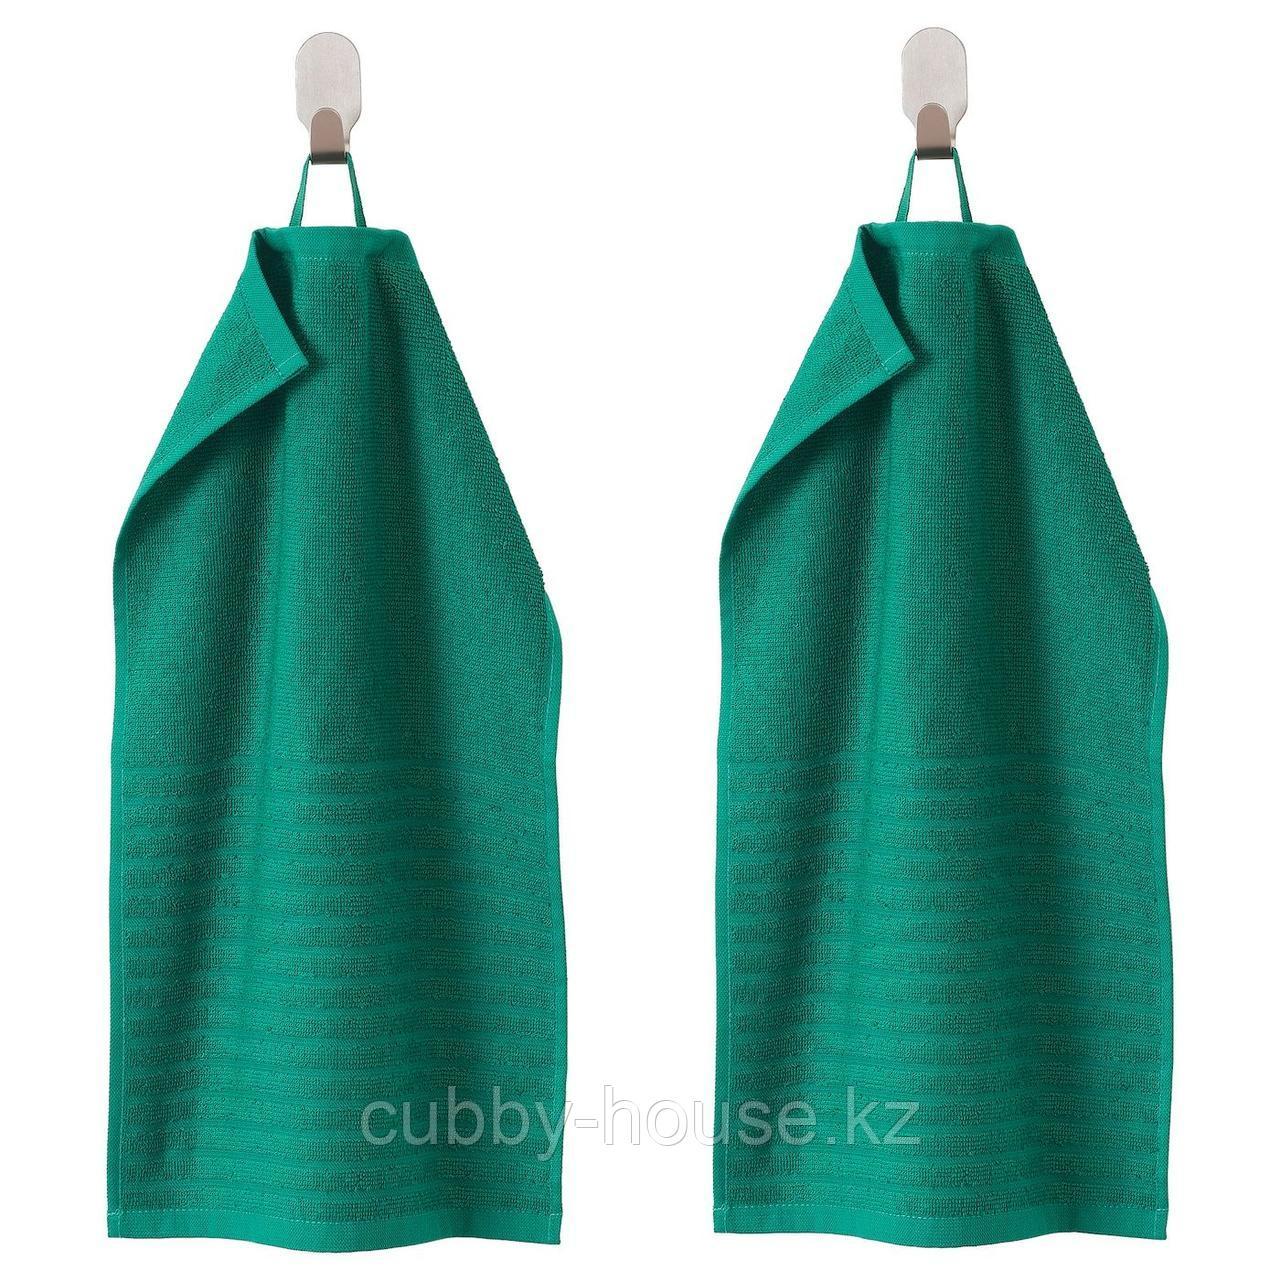 ВОГШЁН Полотенце, темно-зеленый, 30x50 см